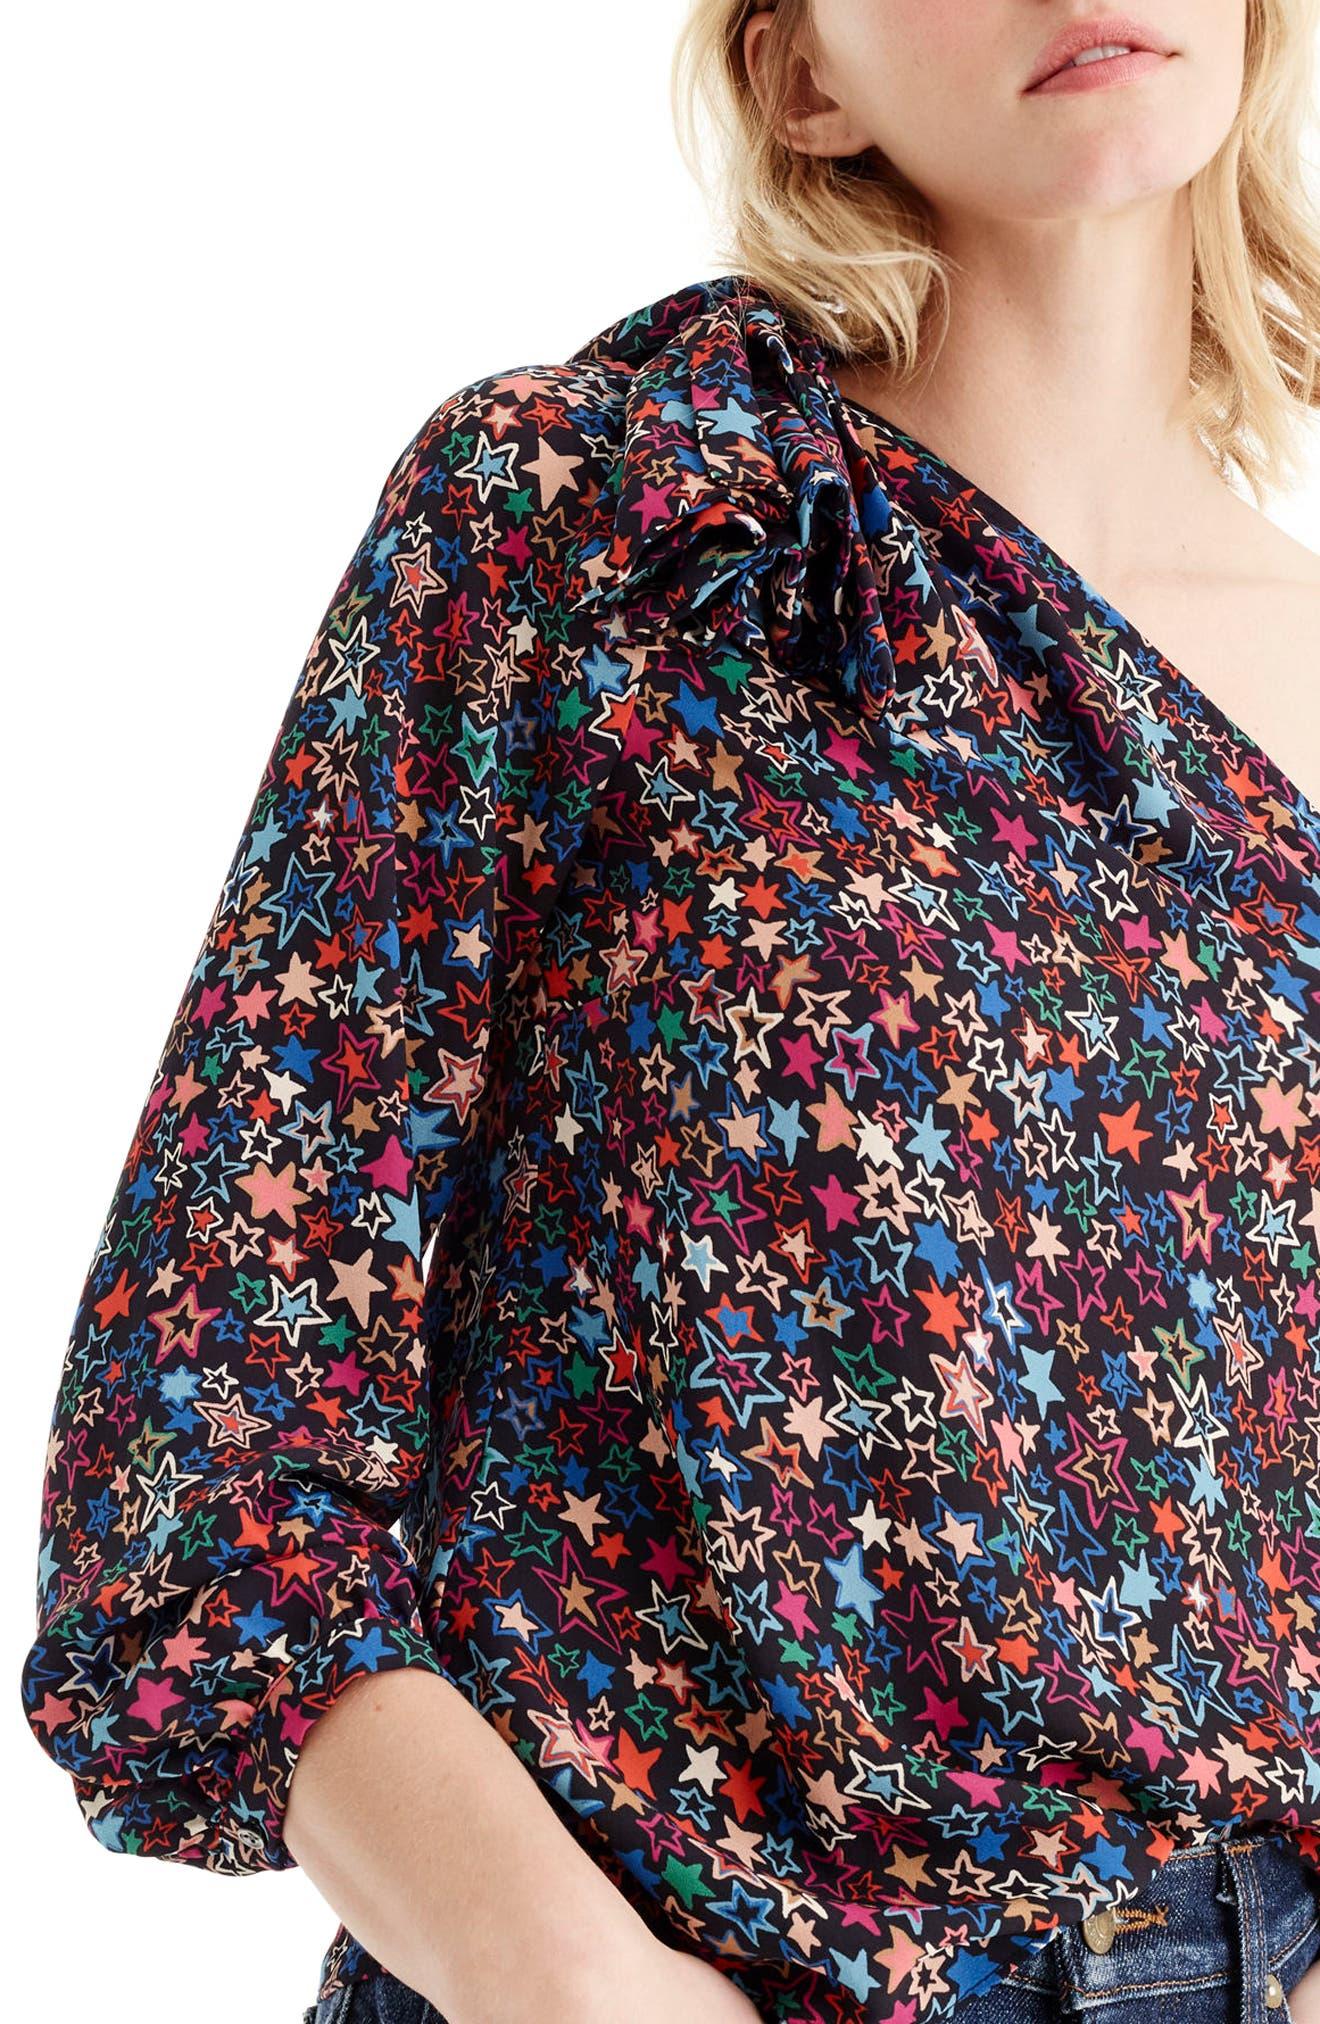 Jacuzzi One-Shoulder Star Print Top,                         Main,                         color, Indigo Multi